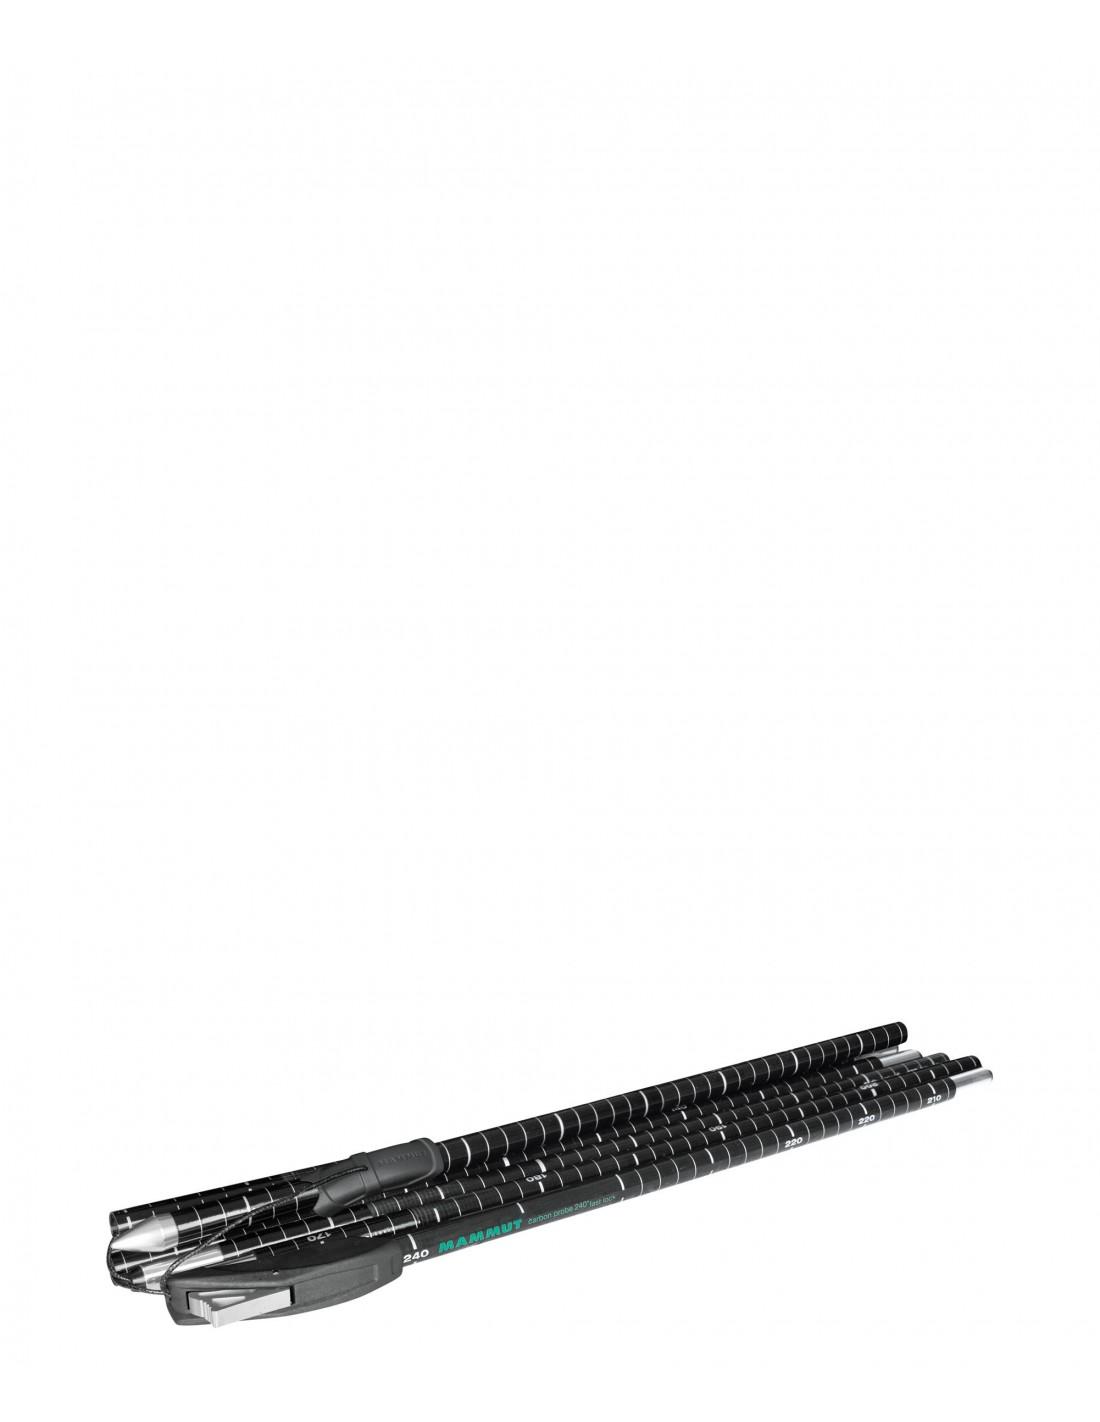 mammut lawinensonde carbon probe 240 fast lock zum. Black Bedroom Furniture Sets. Home Design Ideas